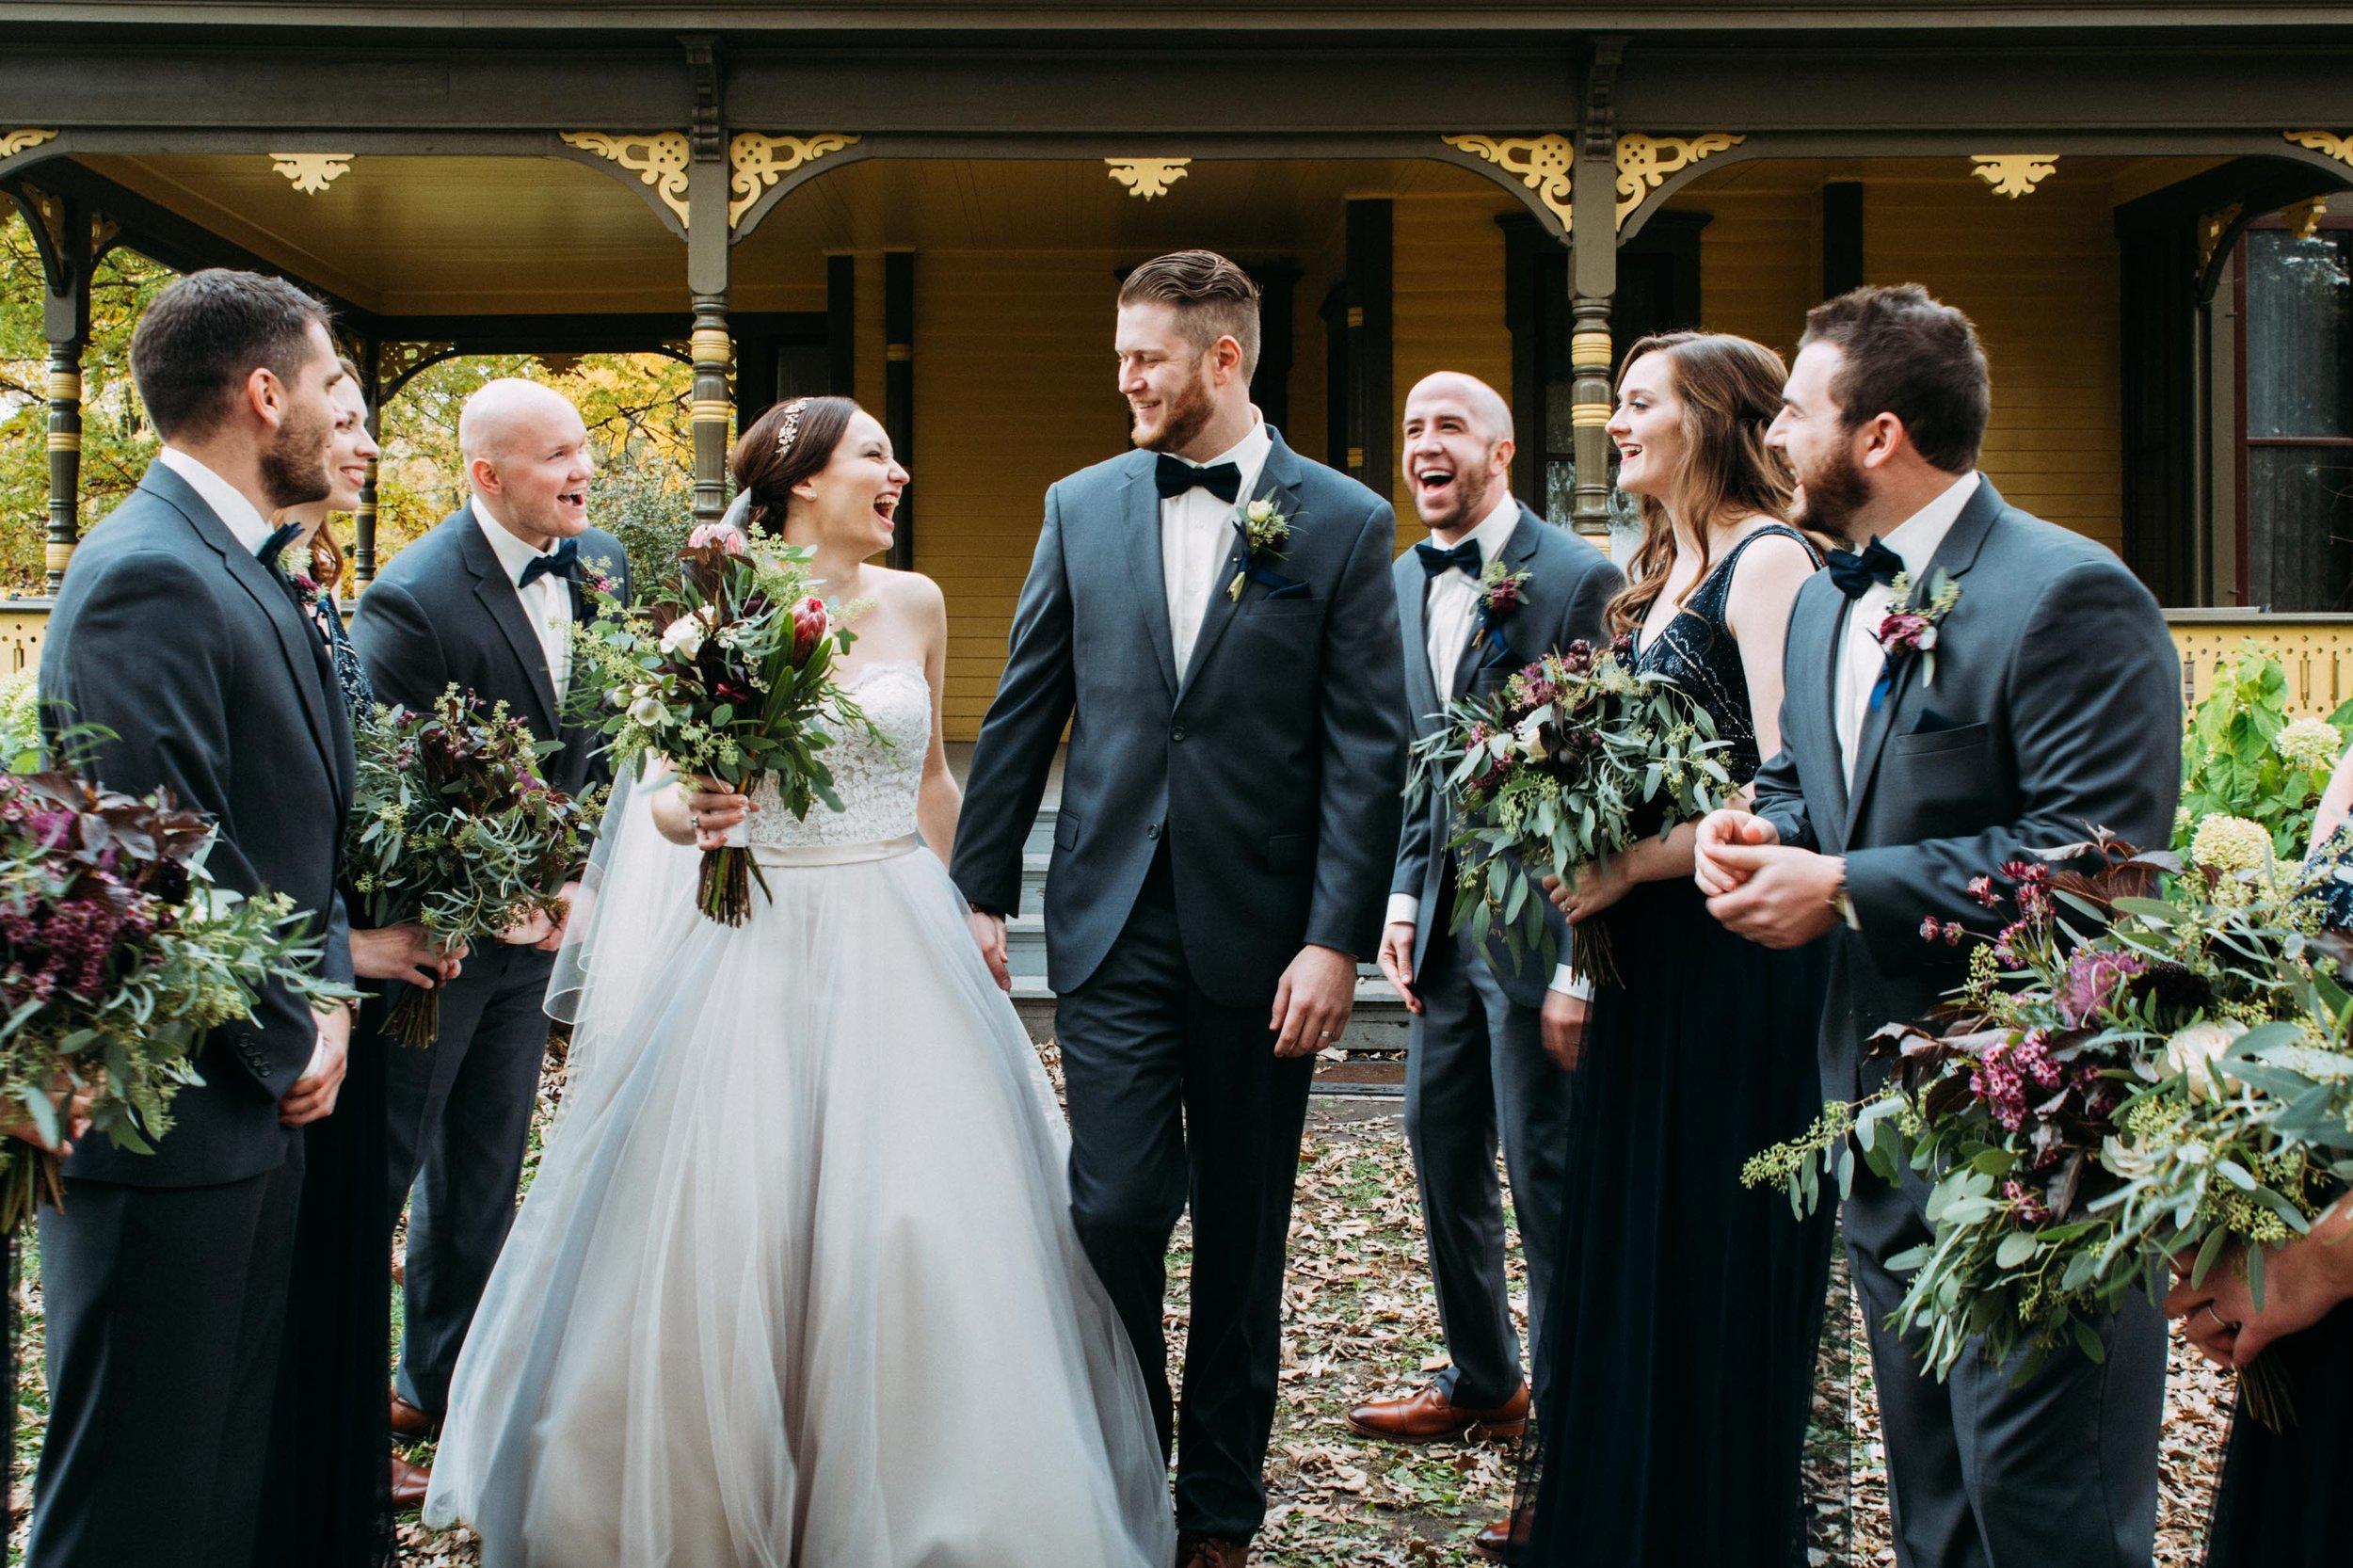 19-Sara_Tom_Wedding_Party_Portraits_Minneapolis_Wedding.jpg